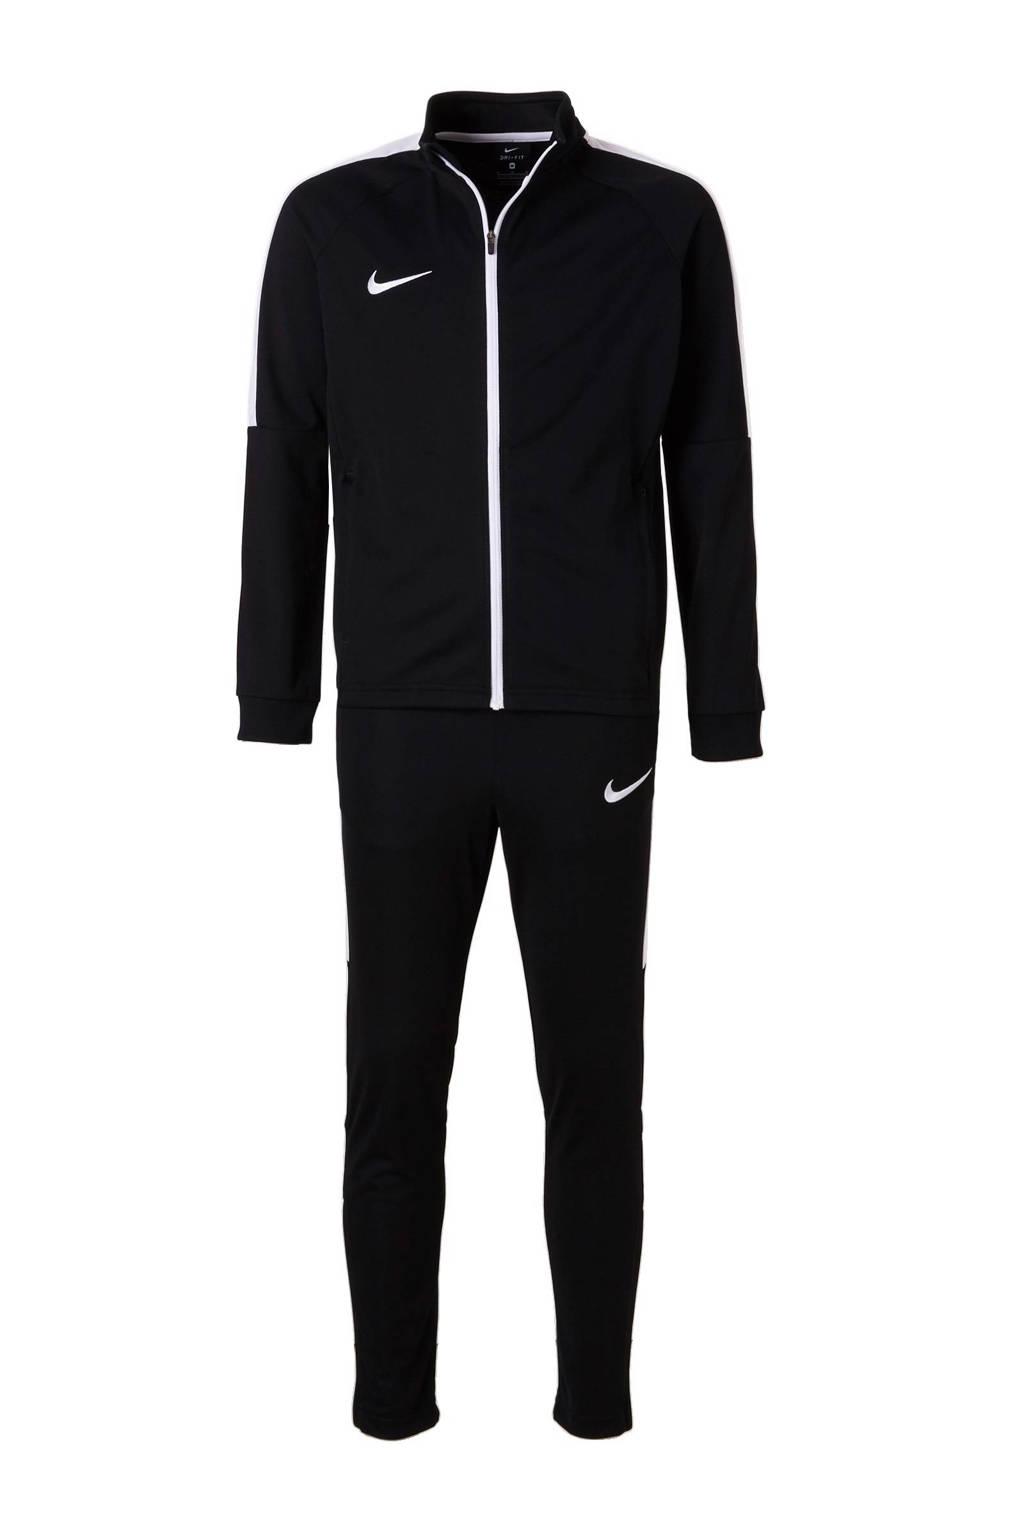 Nike   trainingspak, Zwart/wit